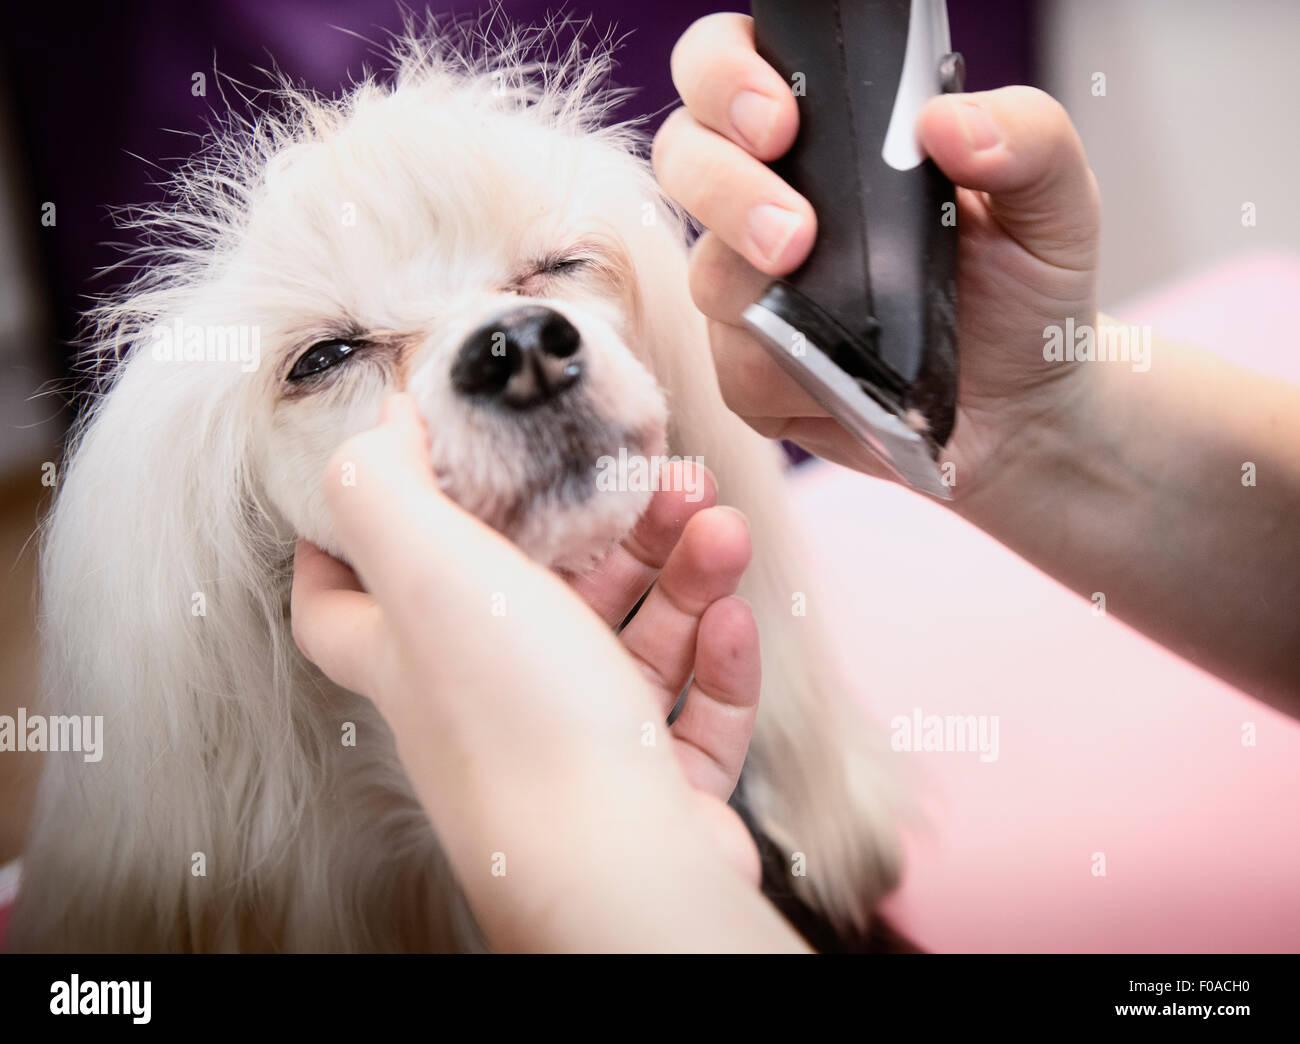 Perro ser arreglados en salon, close-up Imagen De Stock